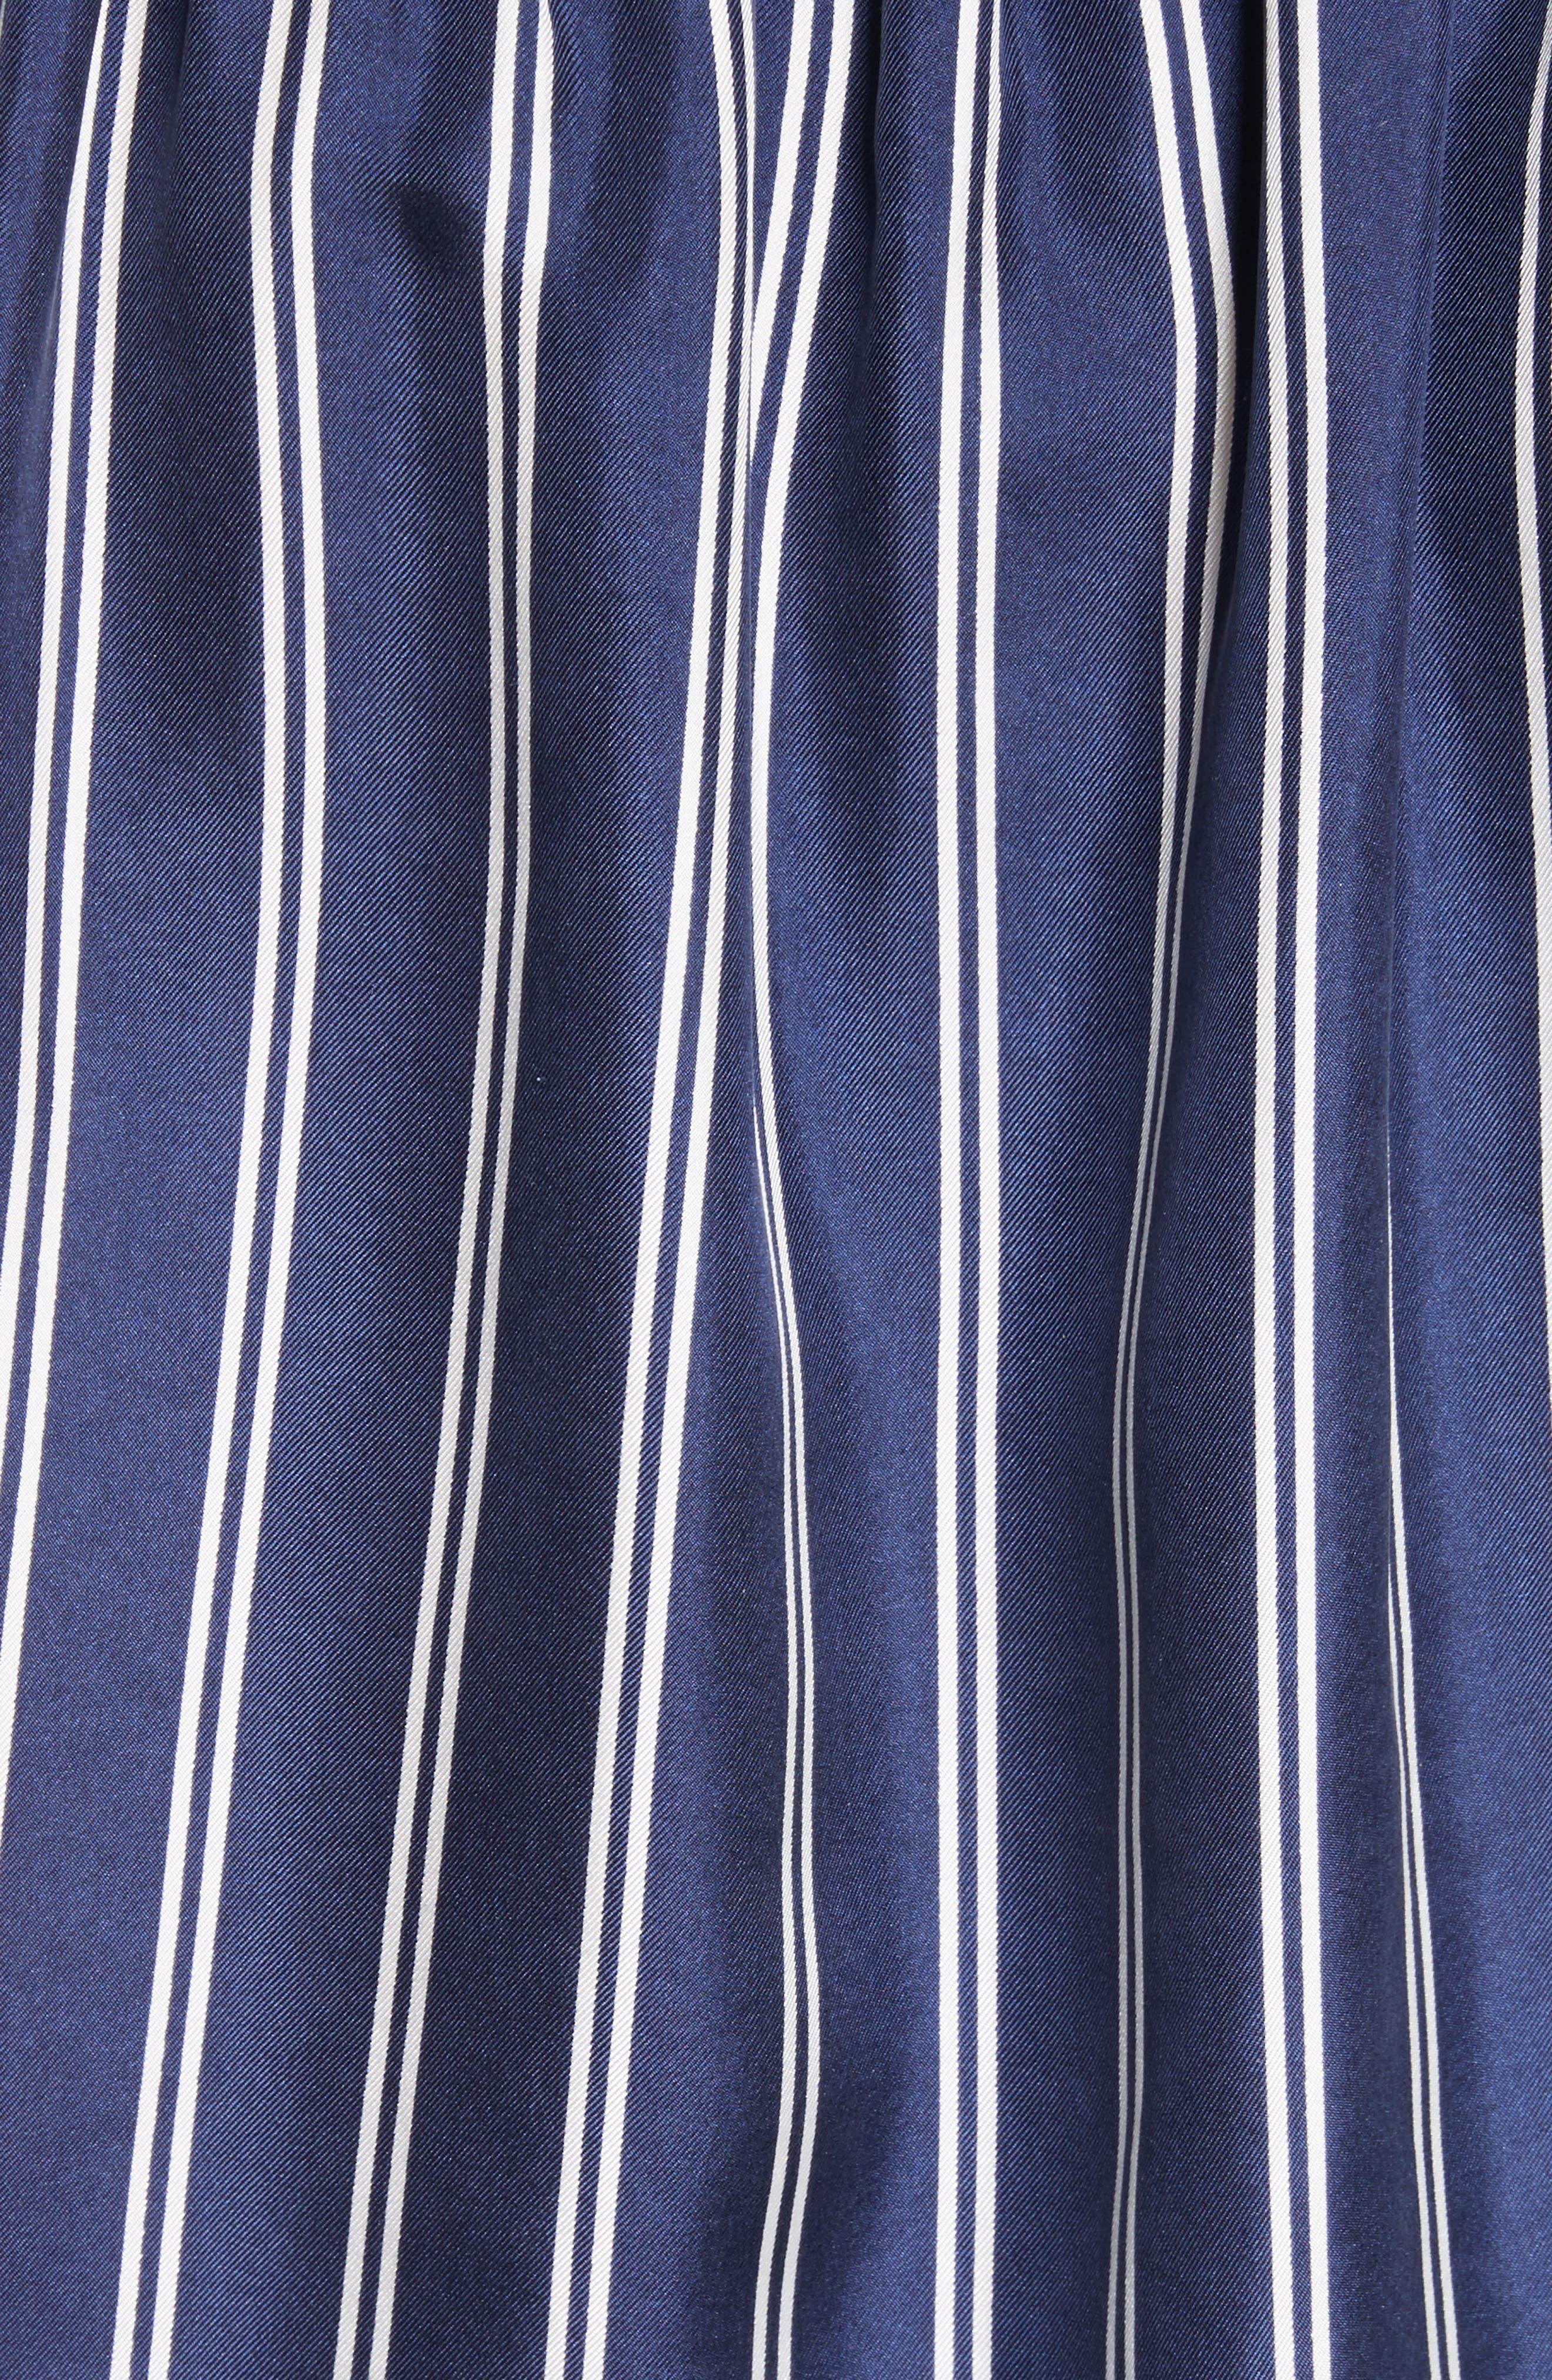 Alternate Image 5  - Joie Adiba Stripe Silk Shirt